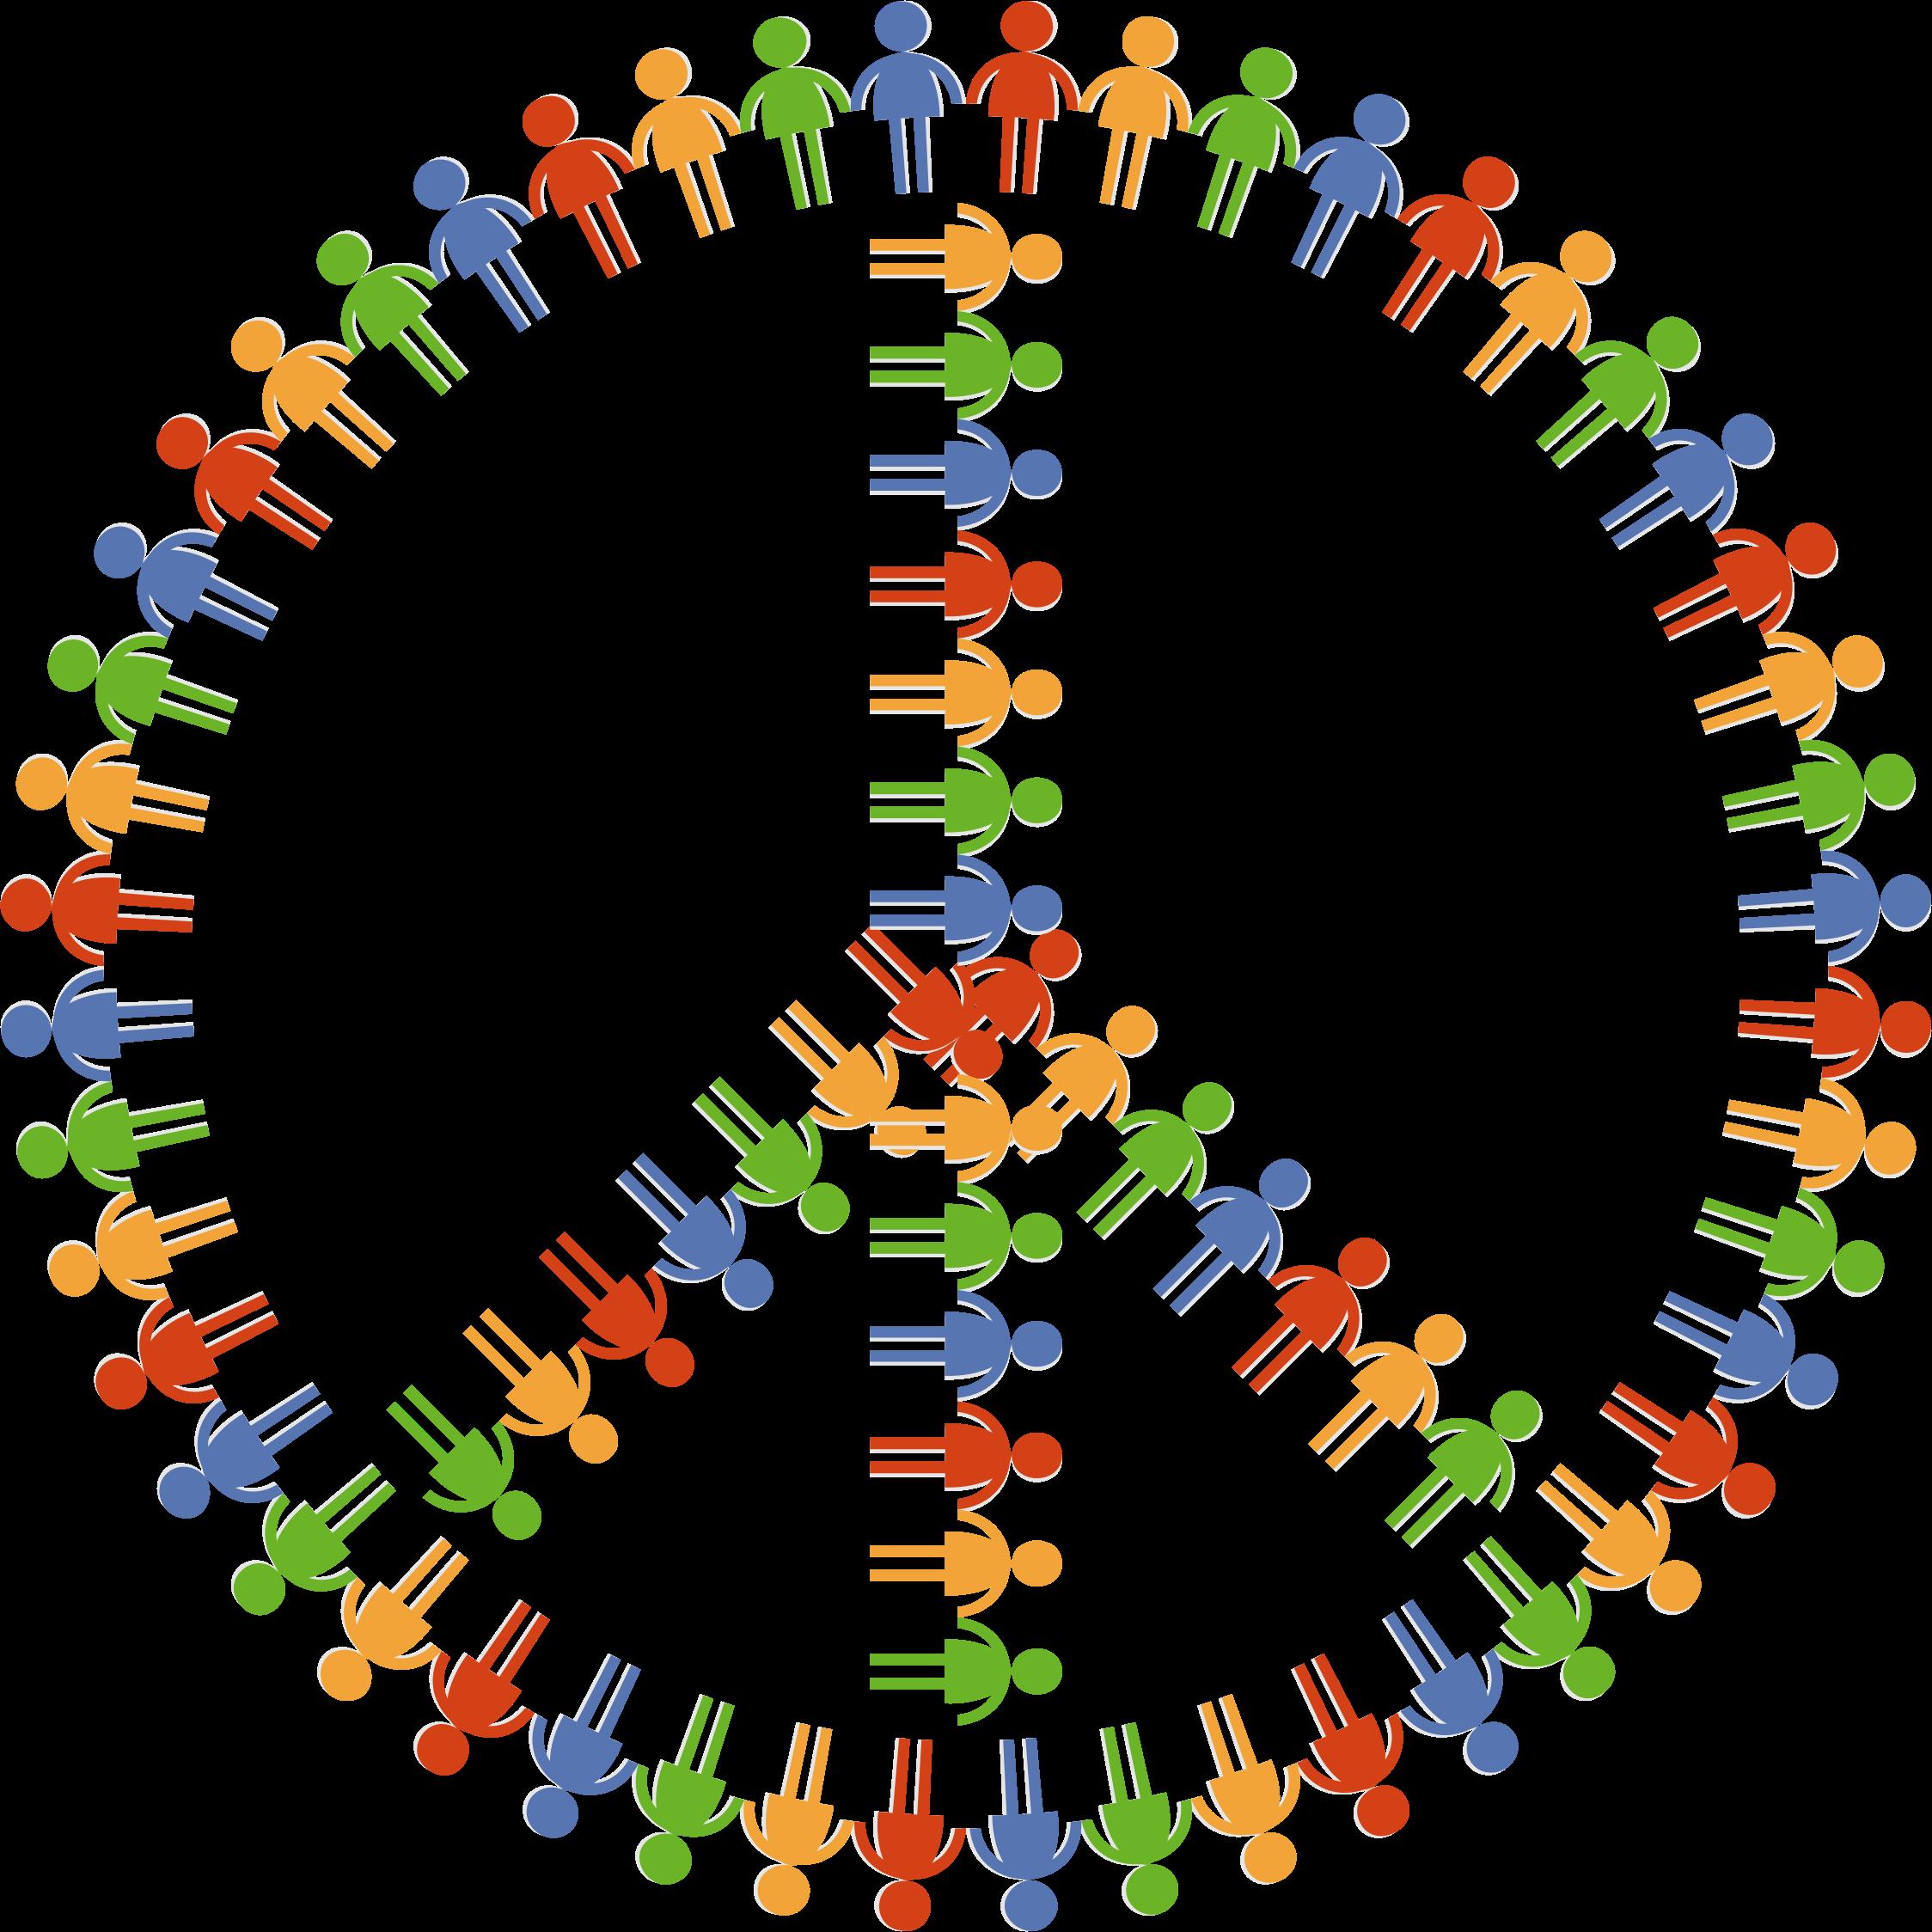 Peace clipart peace harmony. Community sign big image